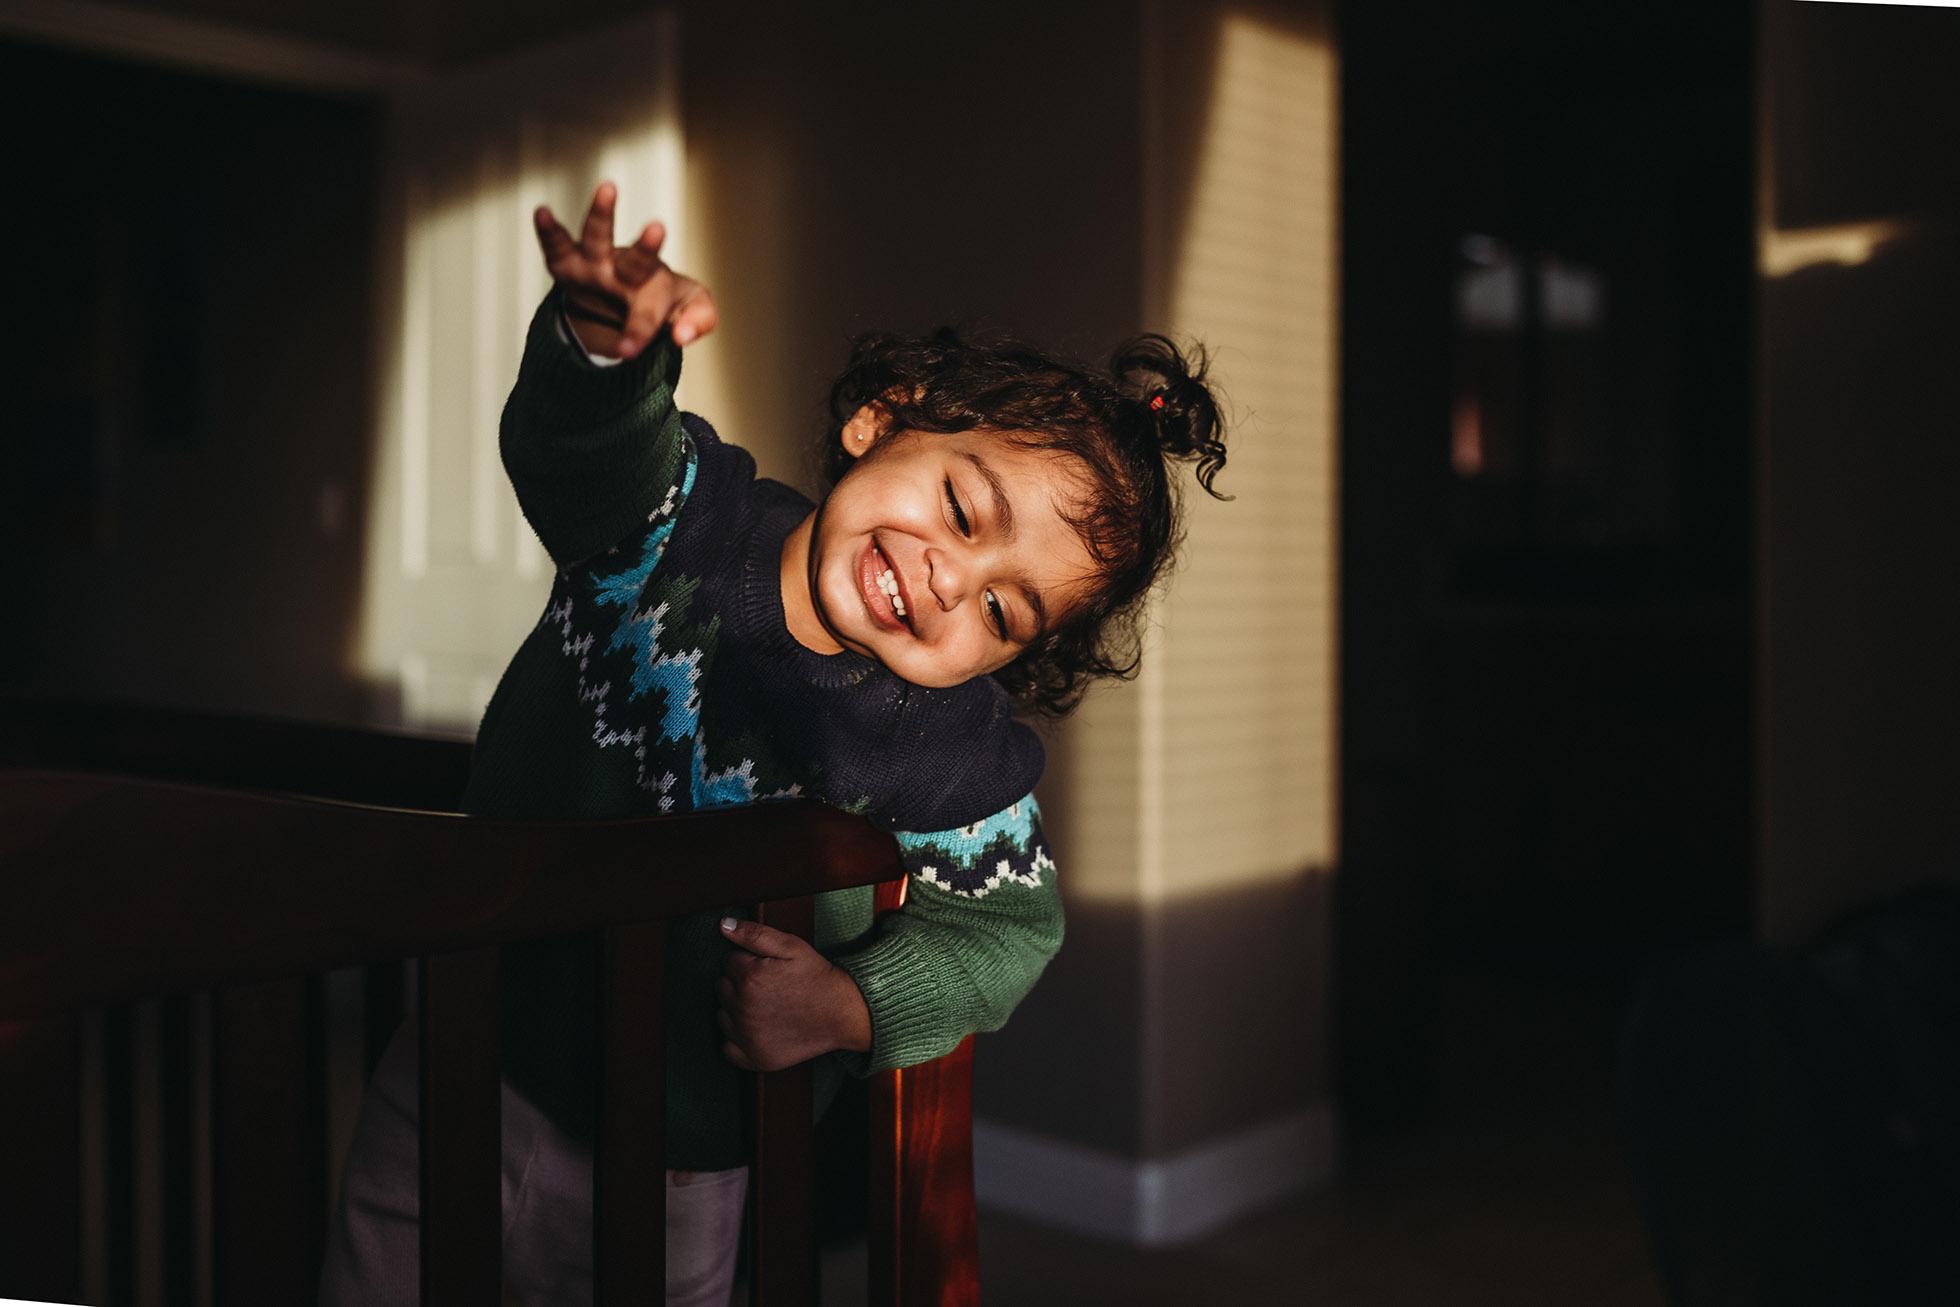 girl smiling in crib jyo bhamdipati